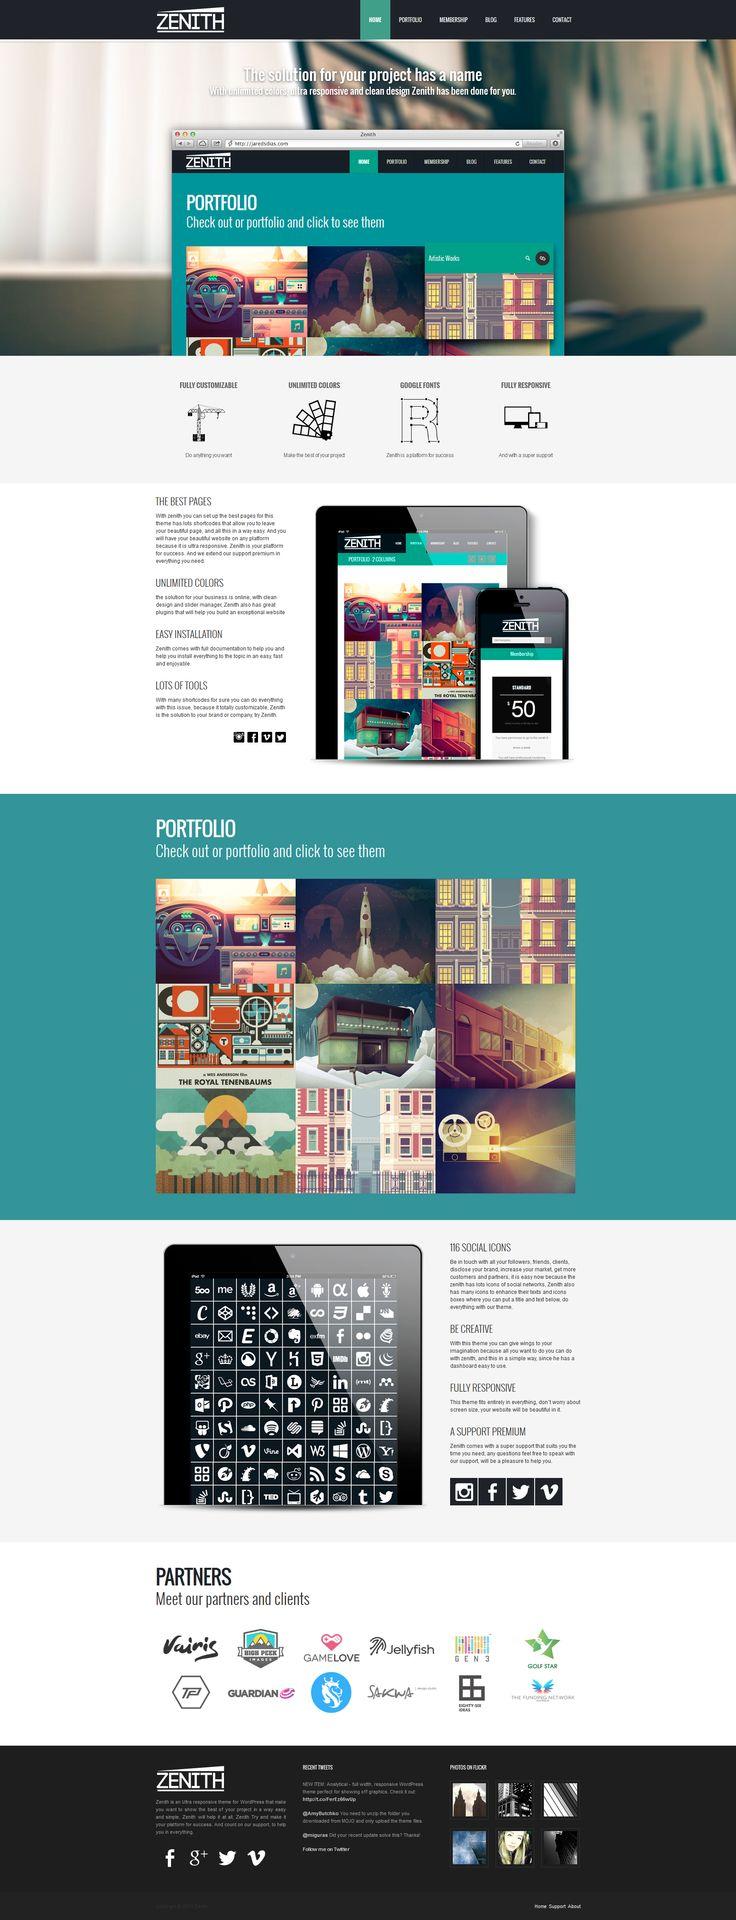 Zenith - Ultimate Portfolio Theme - Mojo Themes  #wordpress #theme #website #template #responsive #design #webdesign #flat #flatdesign #portfolio #creative